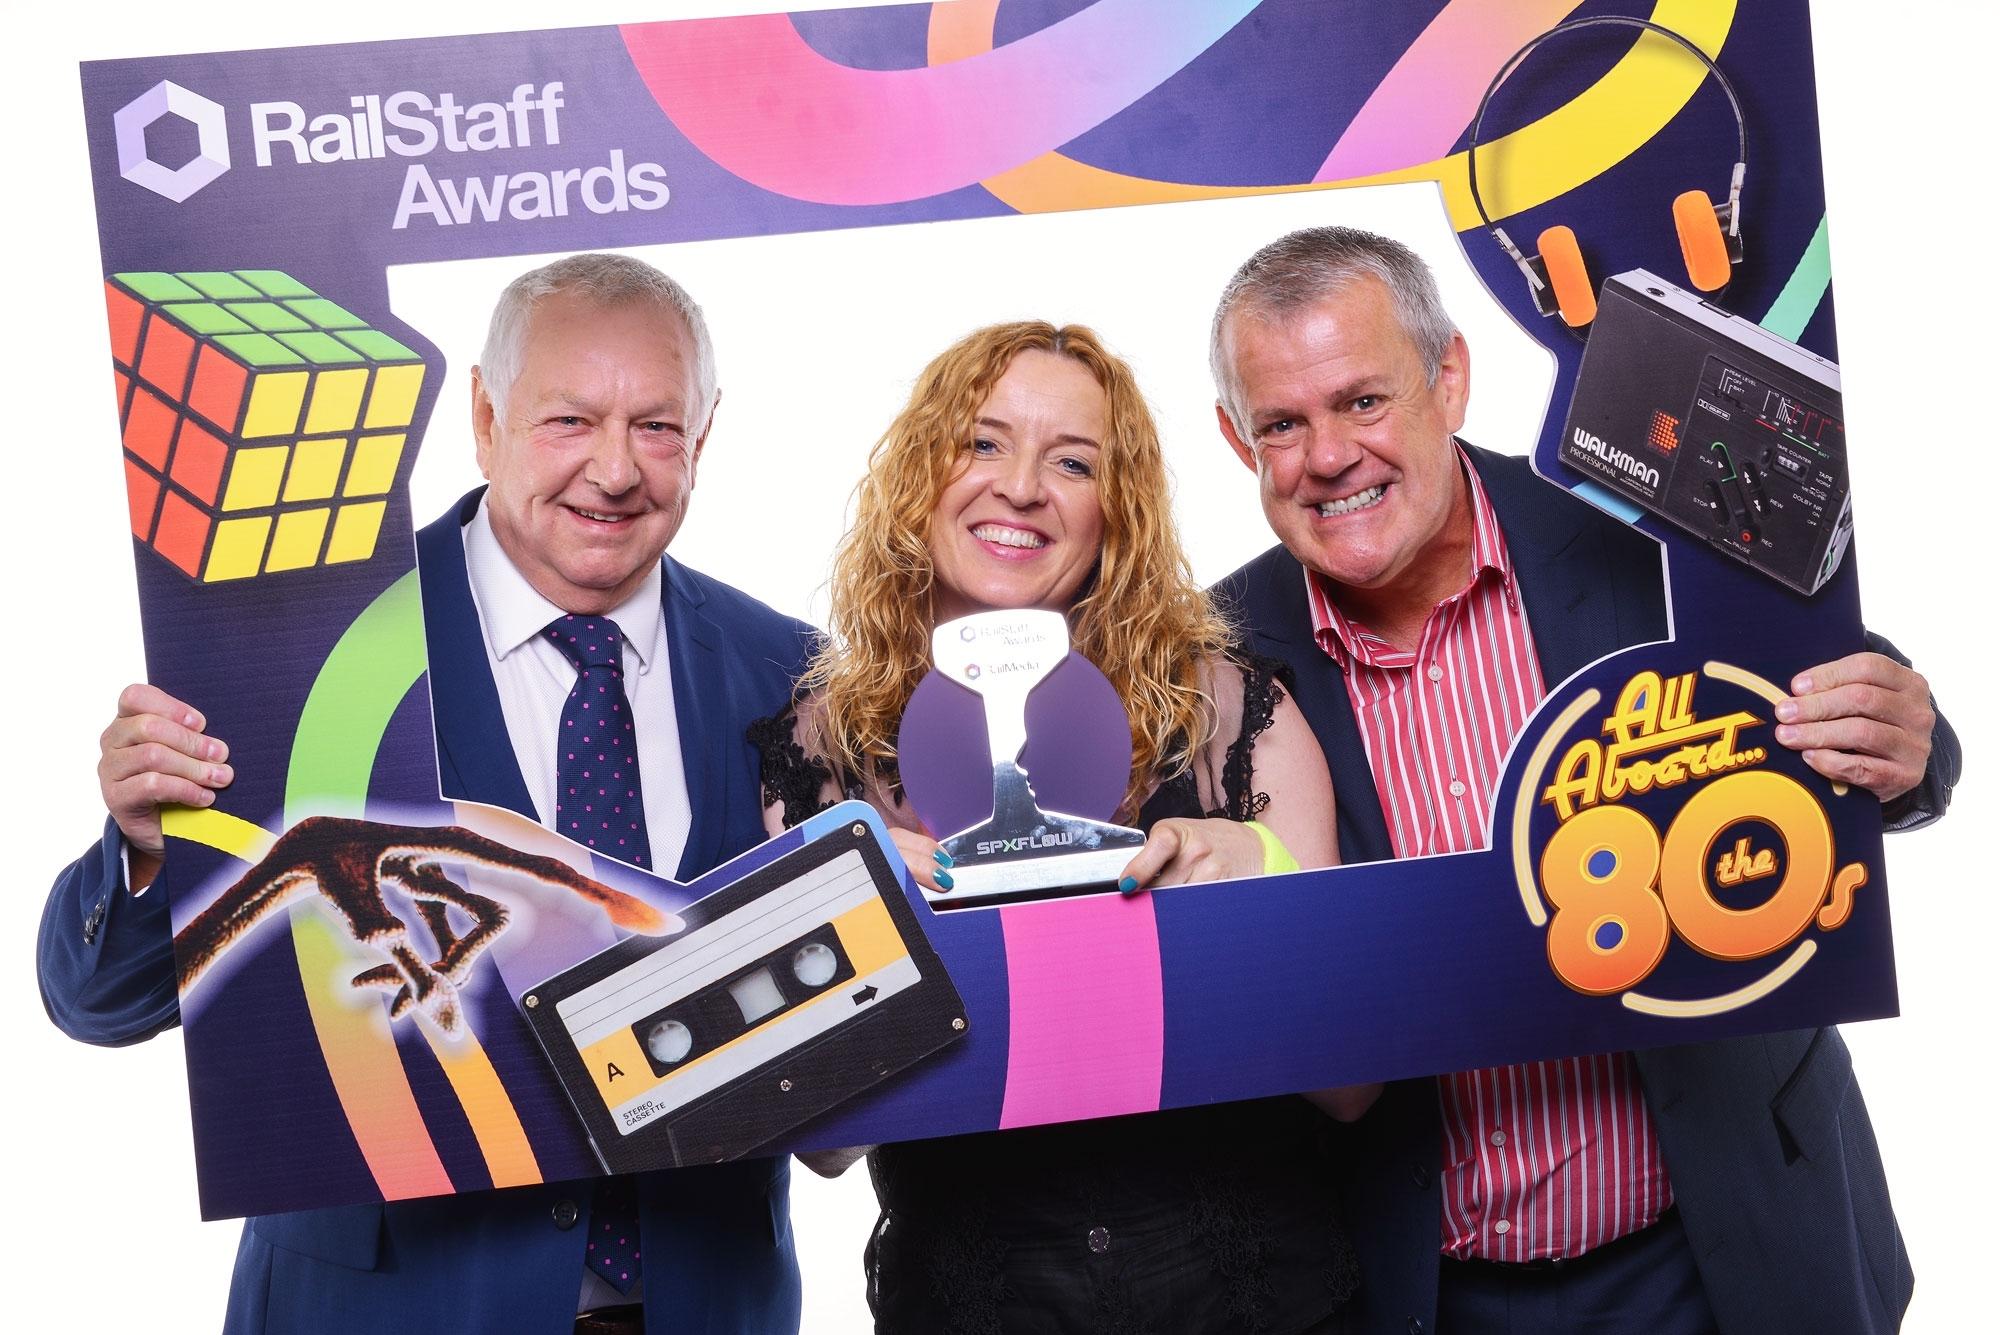 The RailStaff Awards 2017